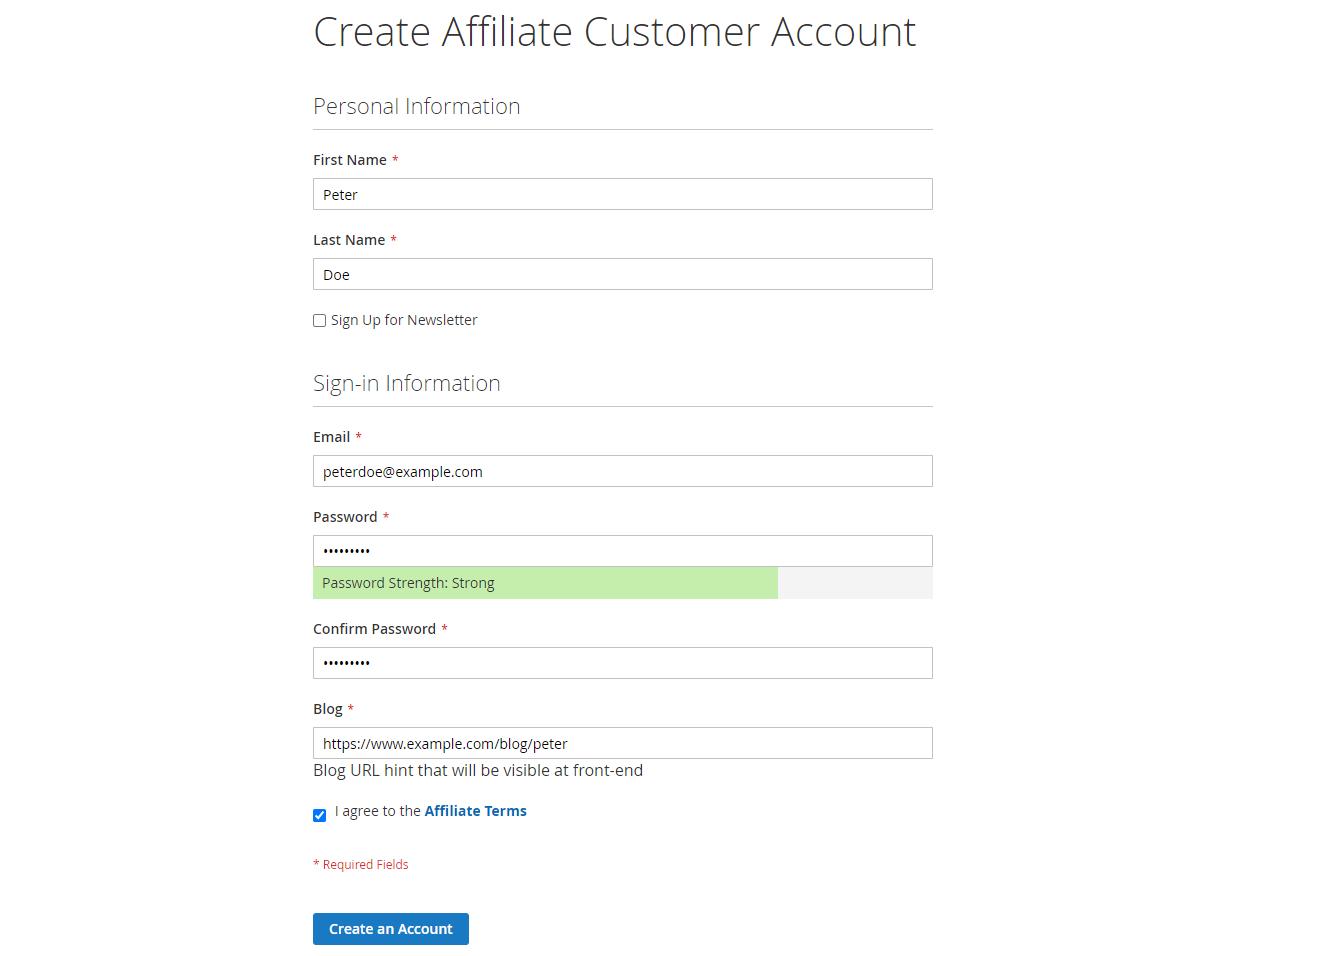 Webkul-Magento2-Affiliate-System-Affiliate-Registration-New